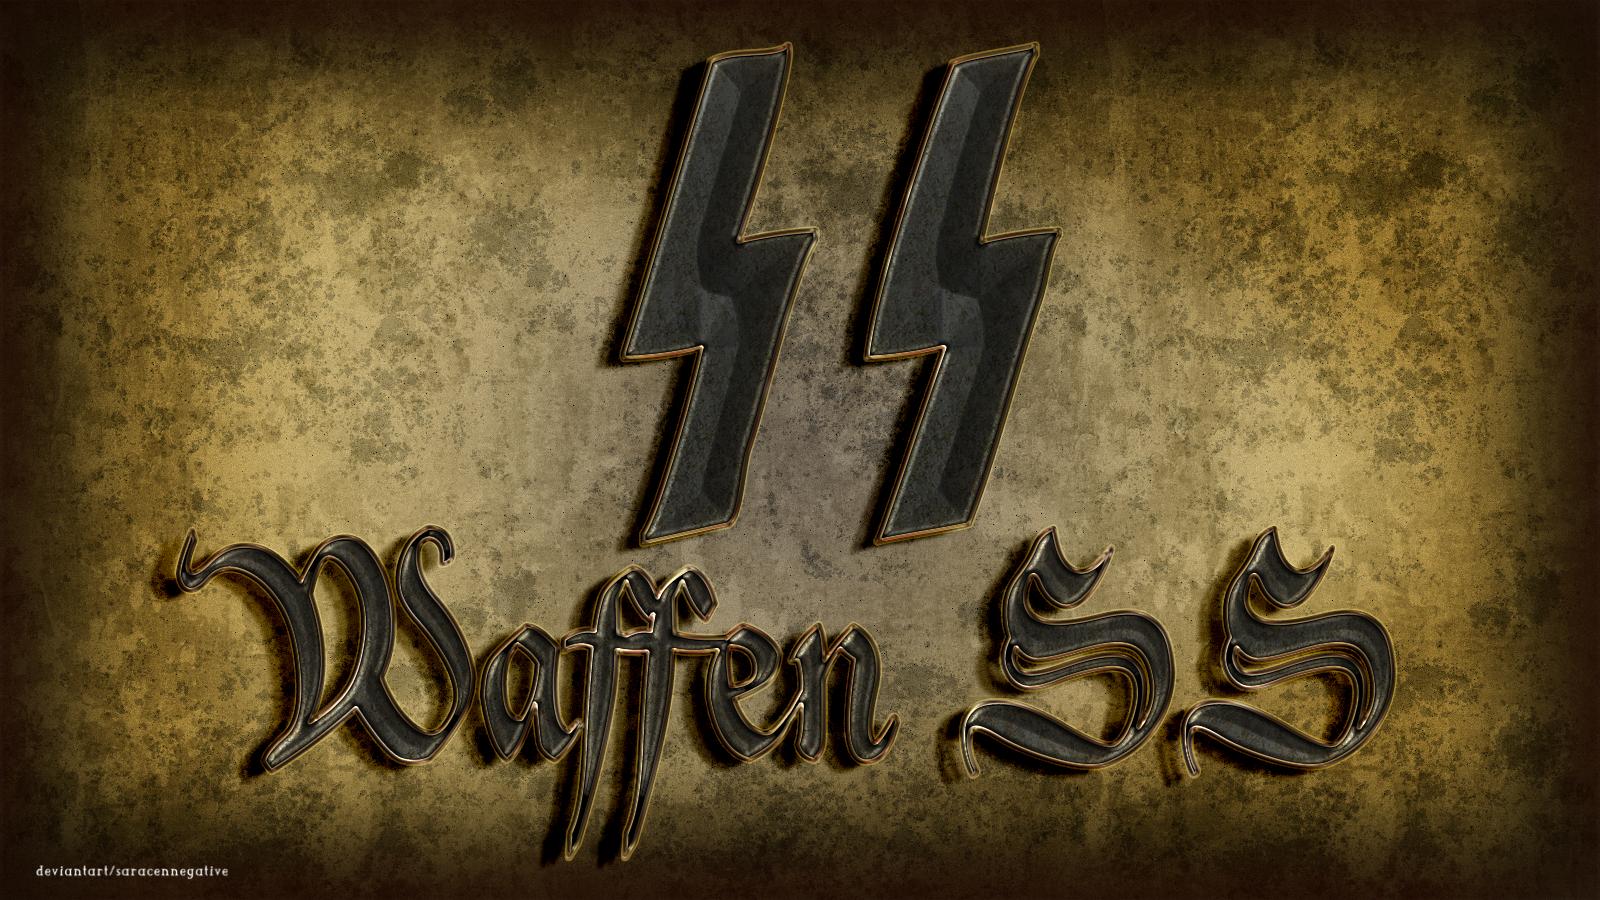 Waffen Ss Flag Wallpaper - Nutrisi glucolife